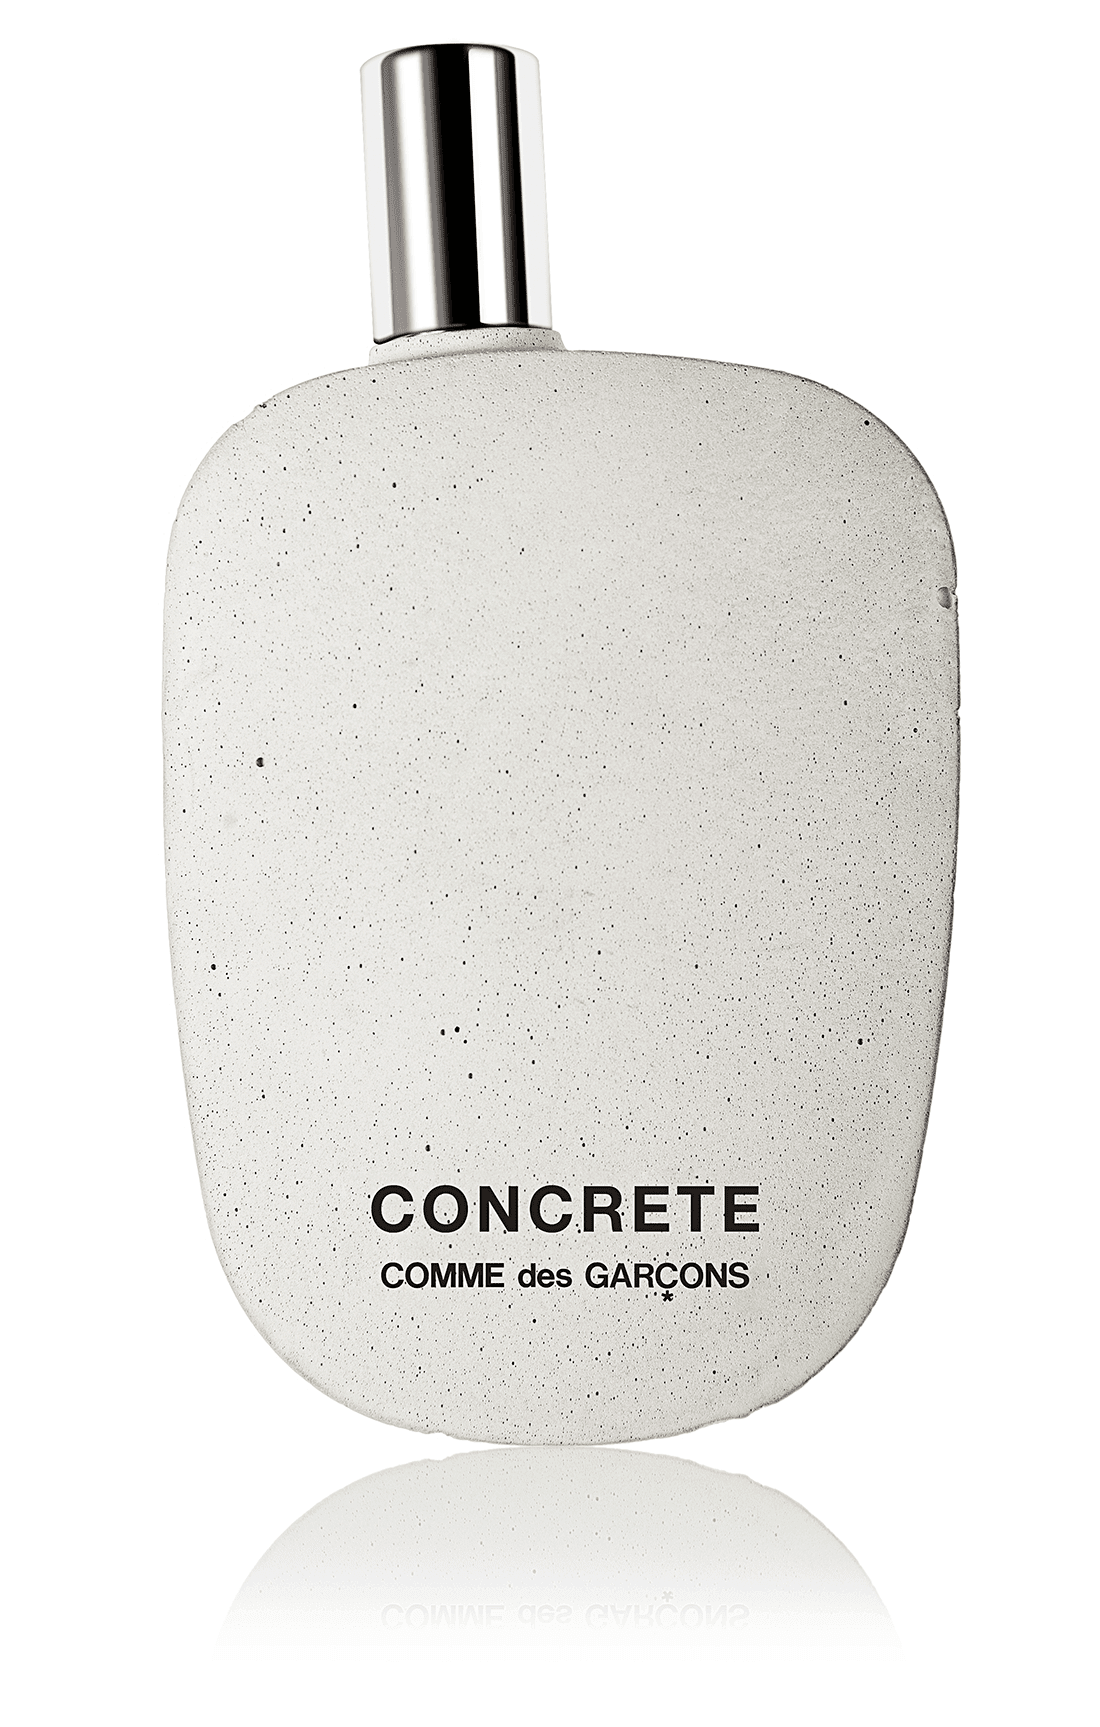 cdg_concrete_bottle_reflection